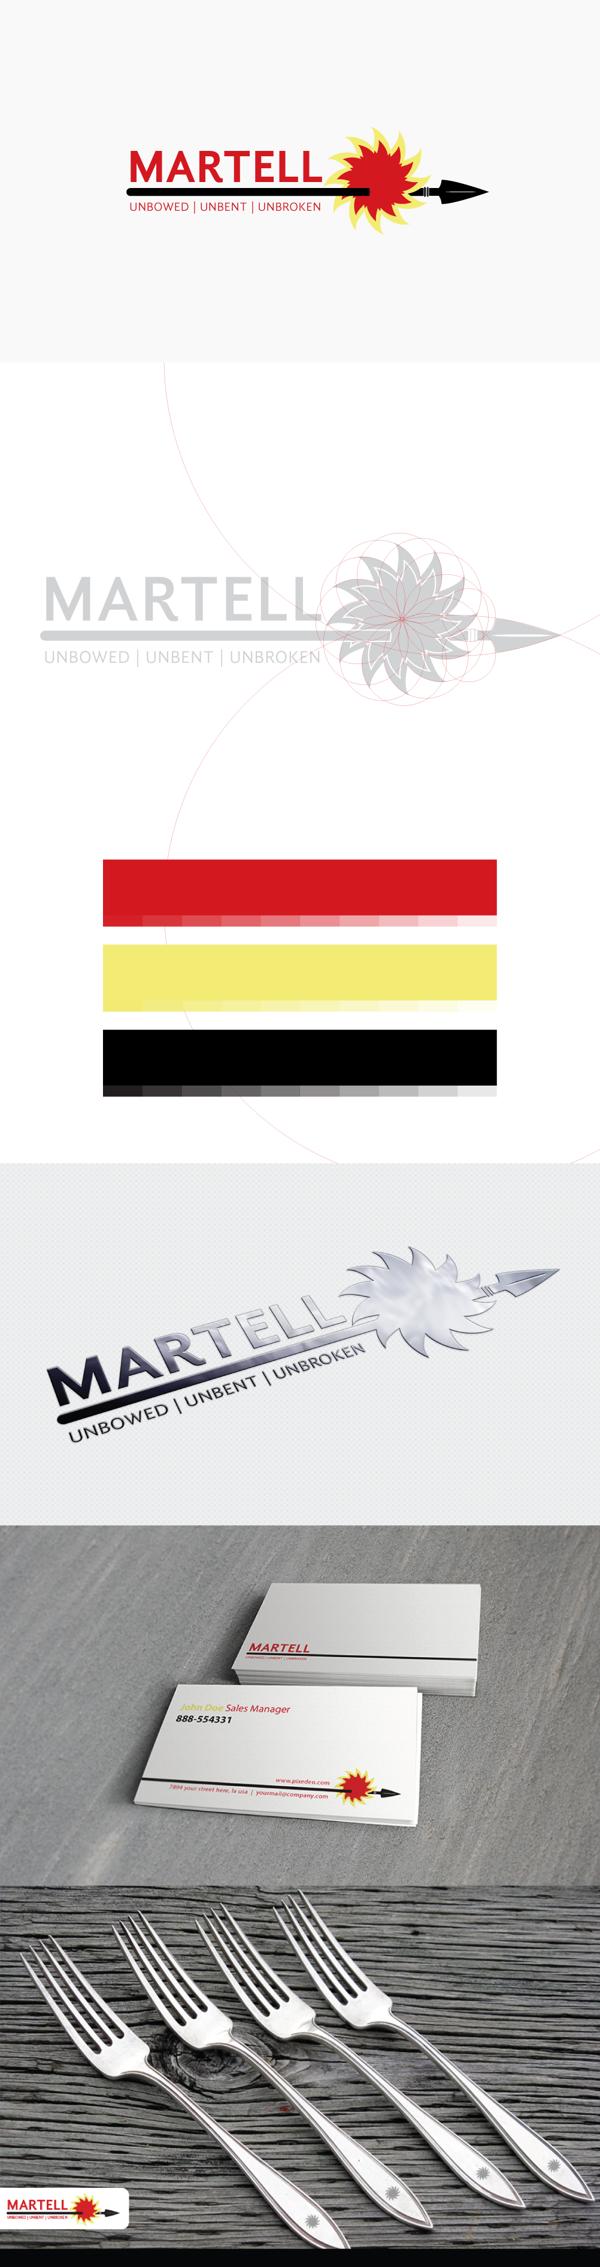 martell-got-le-news-sbh